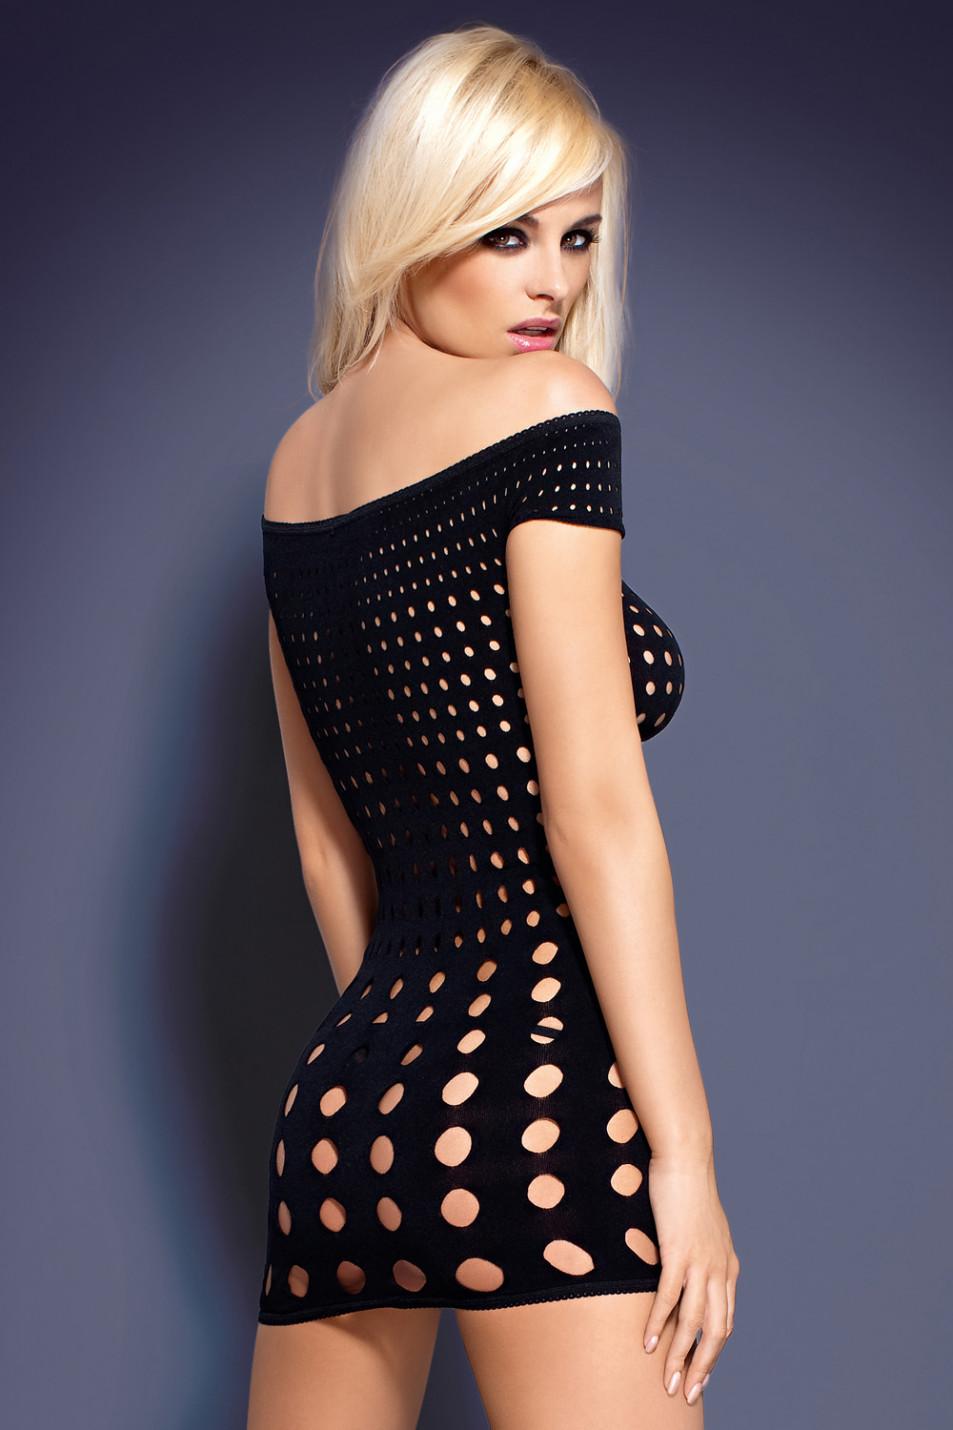 Rhian Sugden Obsessive Lingerie - Nude Celebs, Glamour